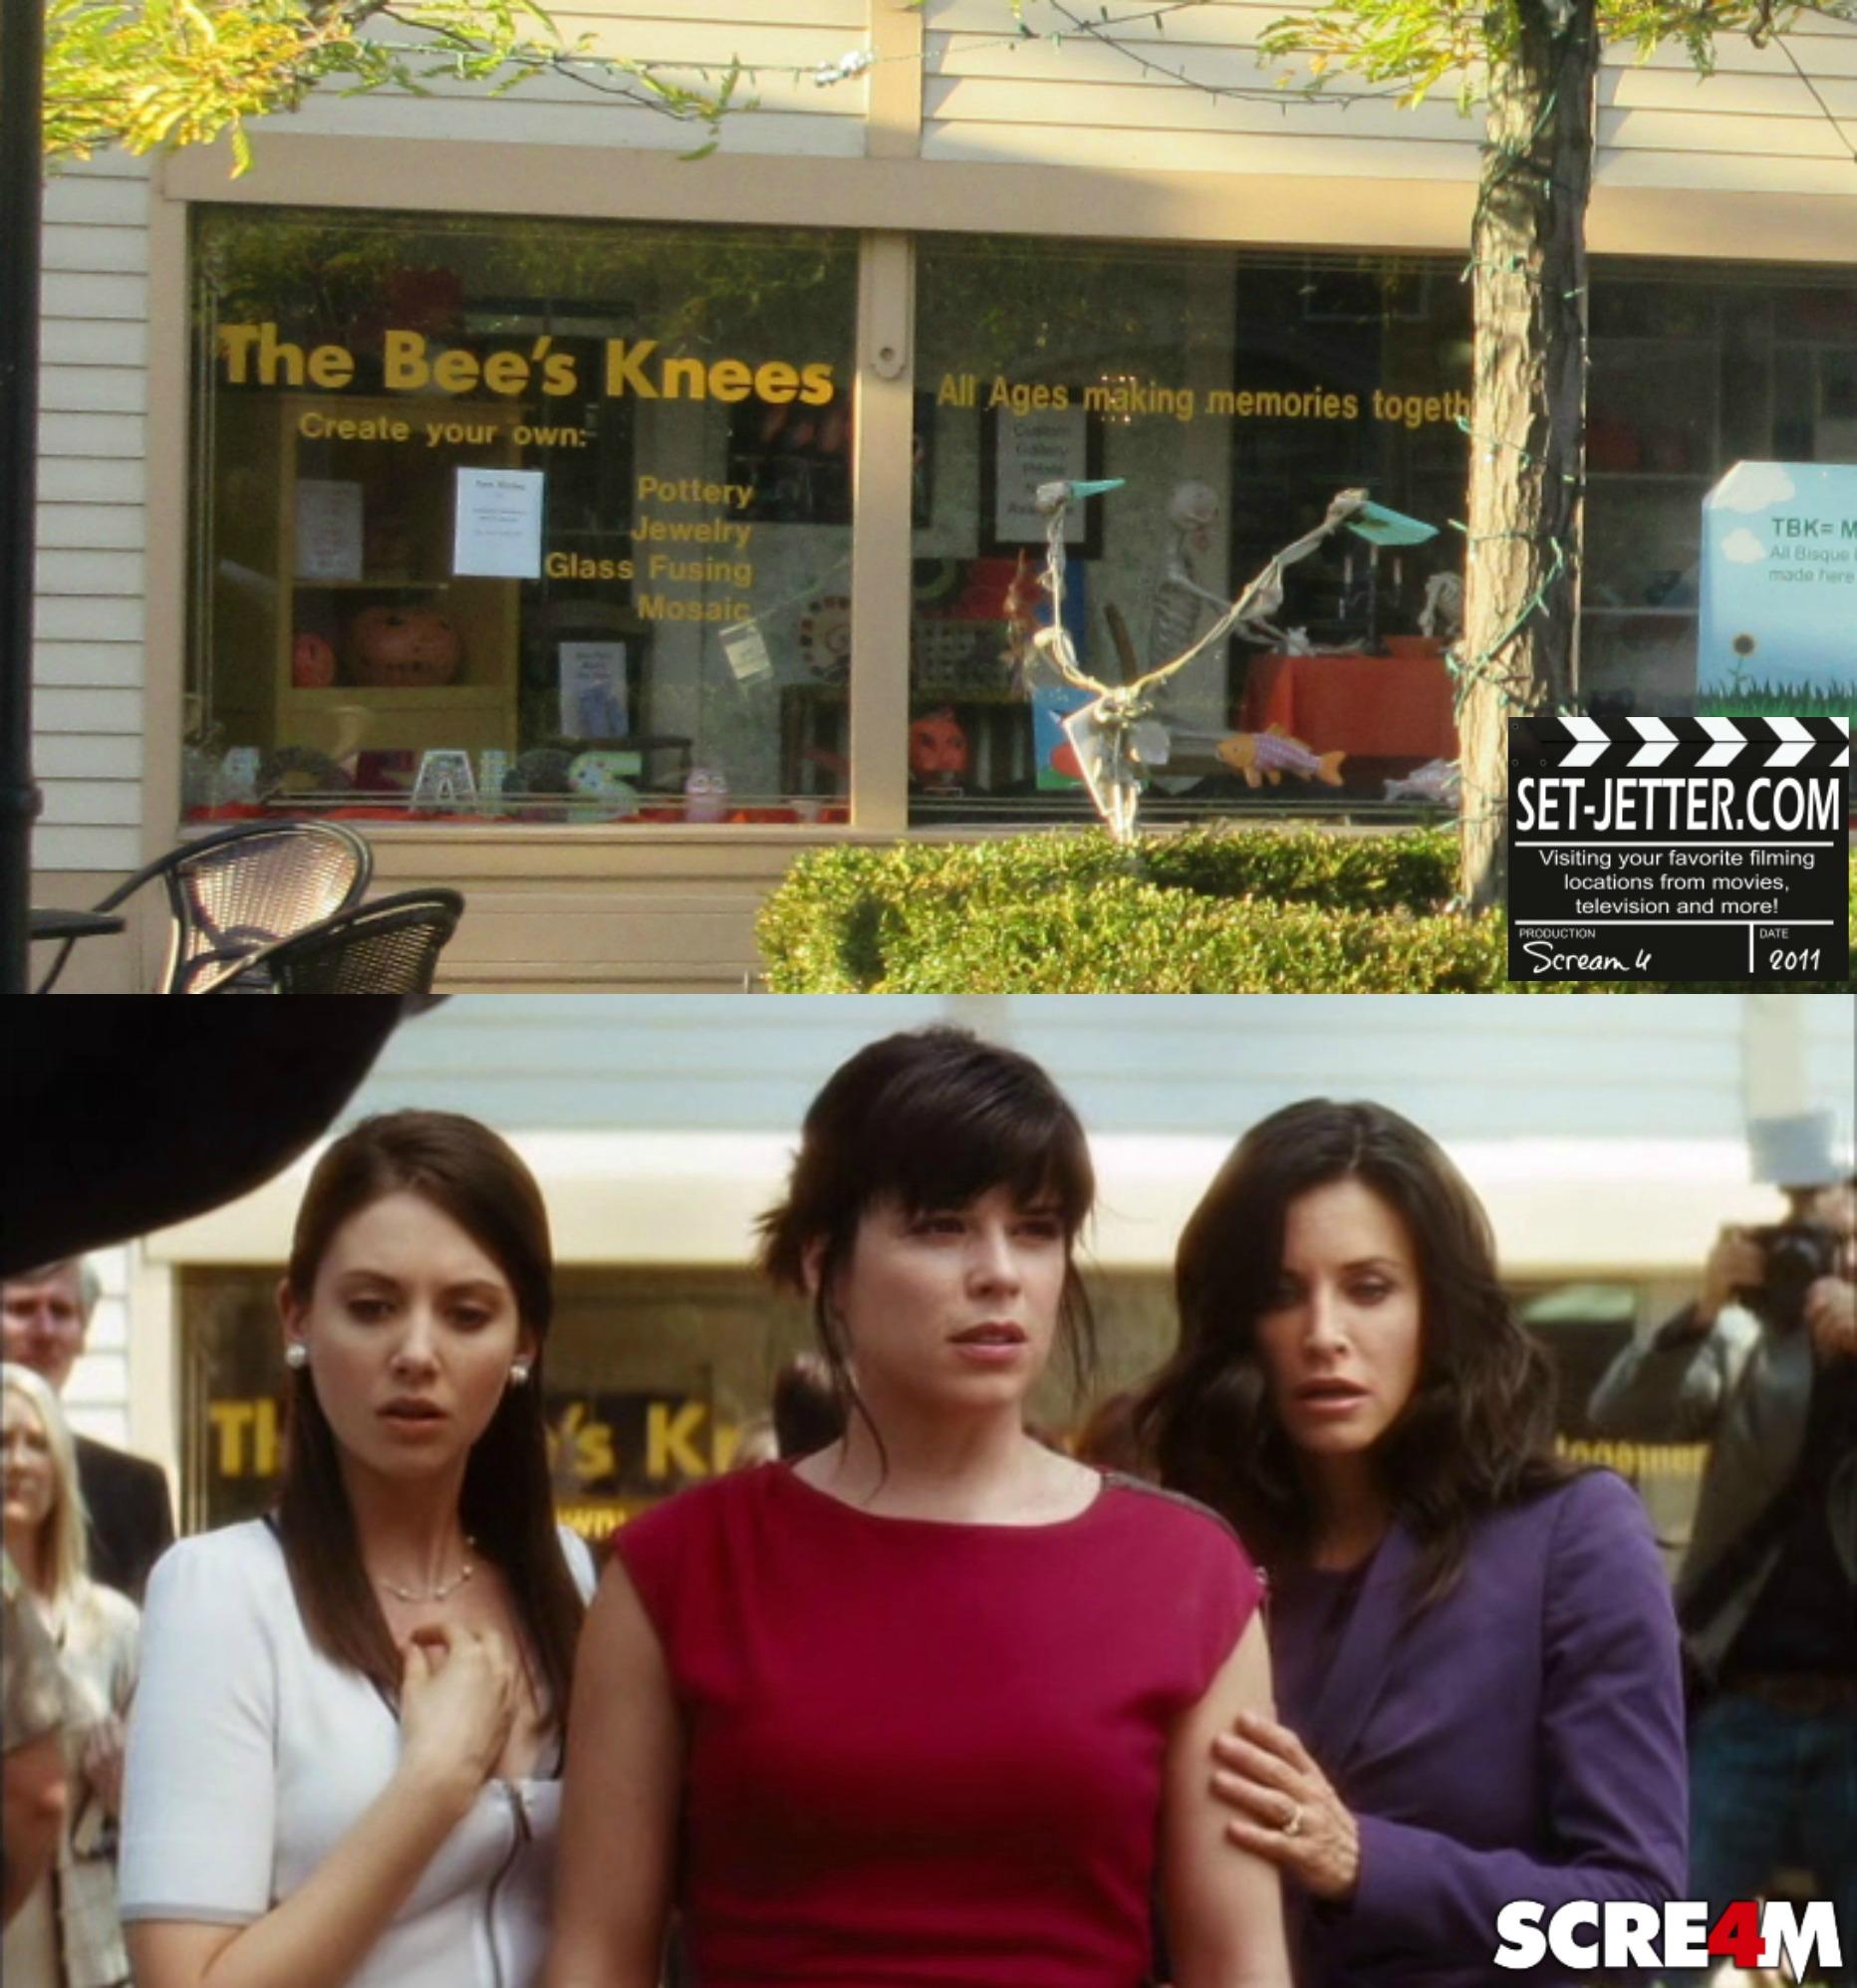 Scream4 comparison 87.jpg